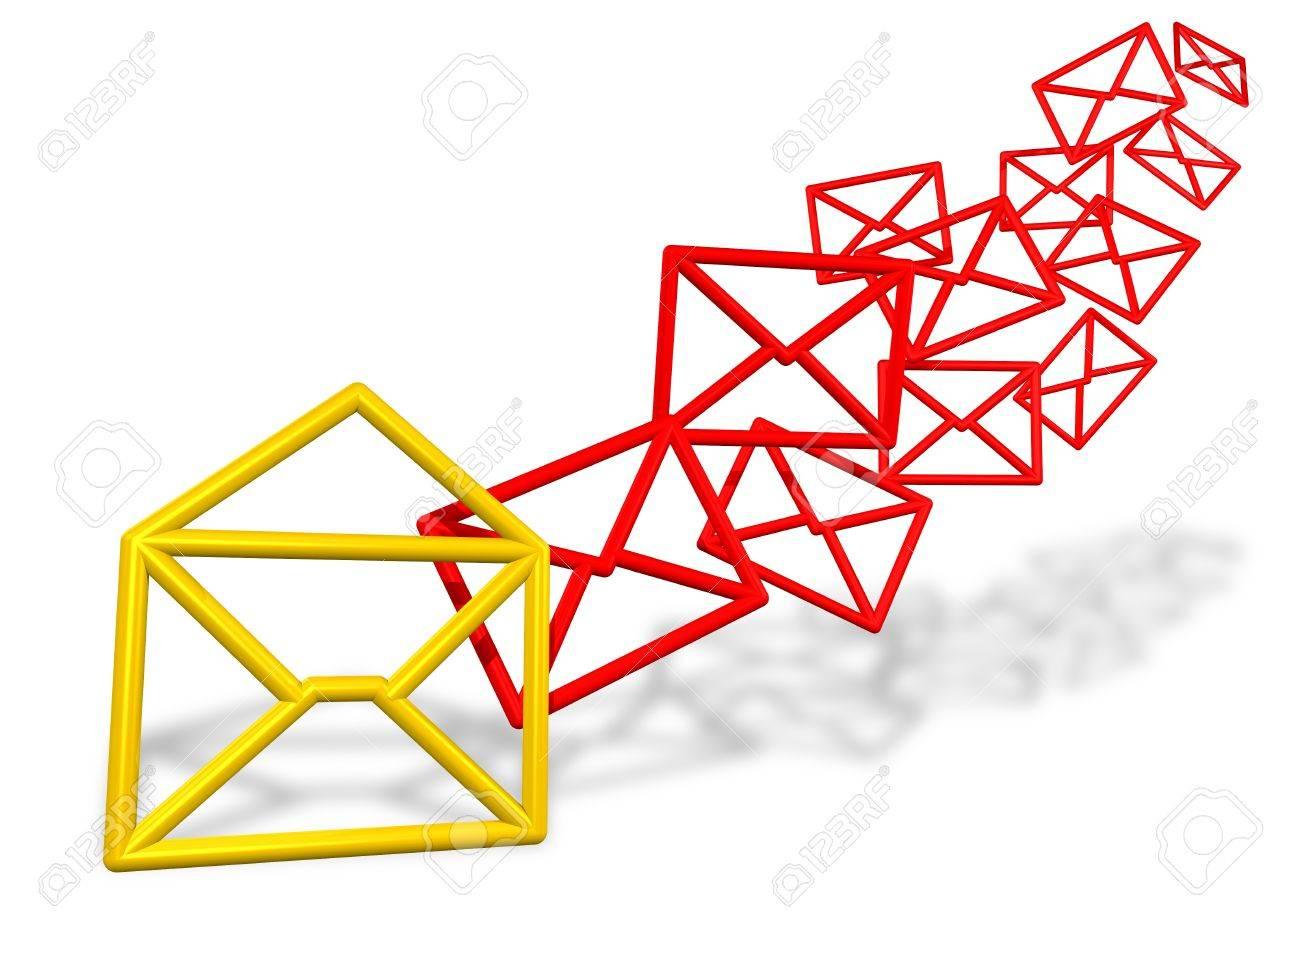 E-mail envelope symbols flowing Stock Photo - 11697055